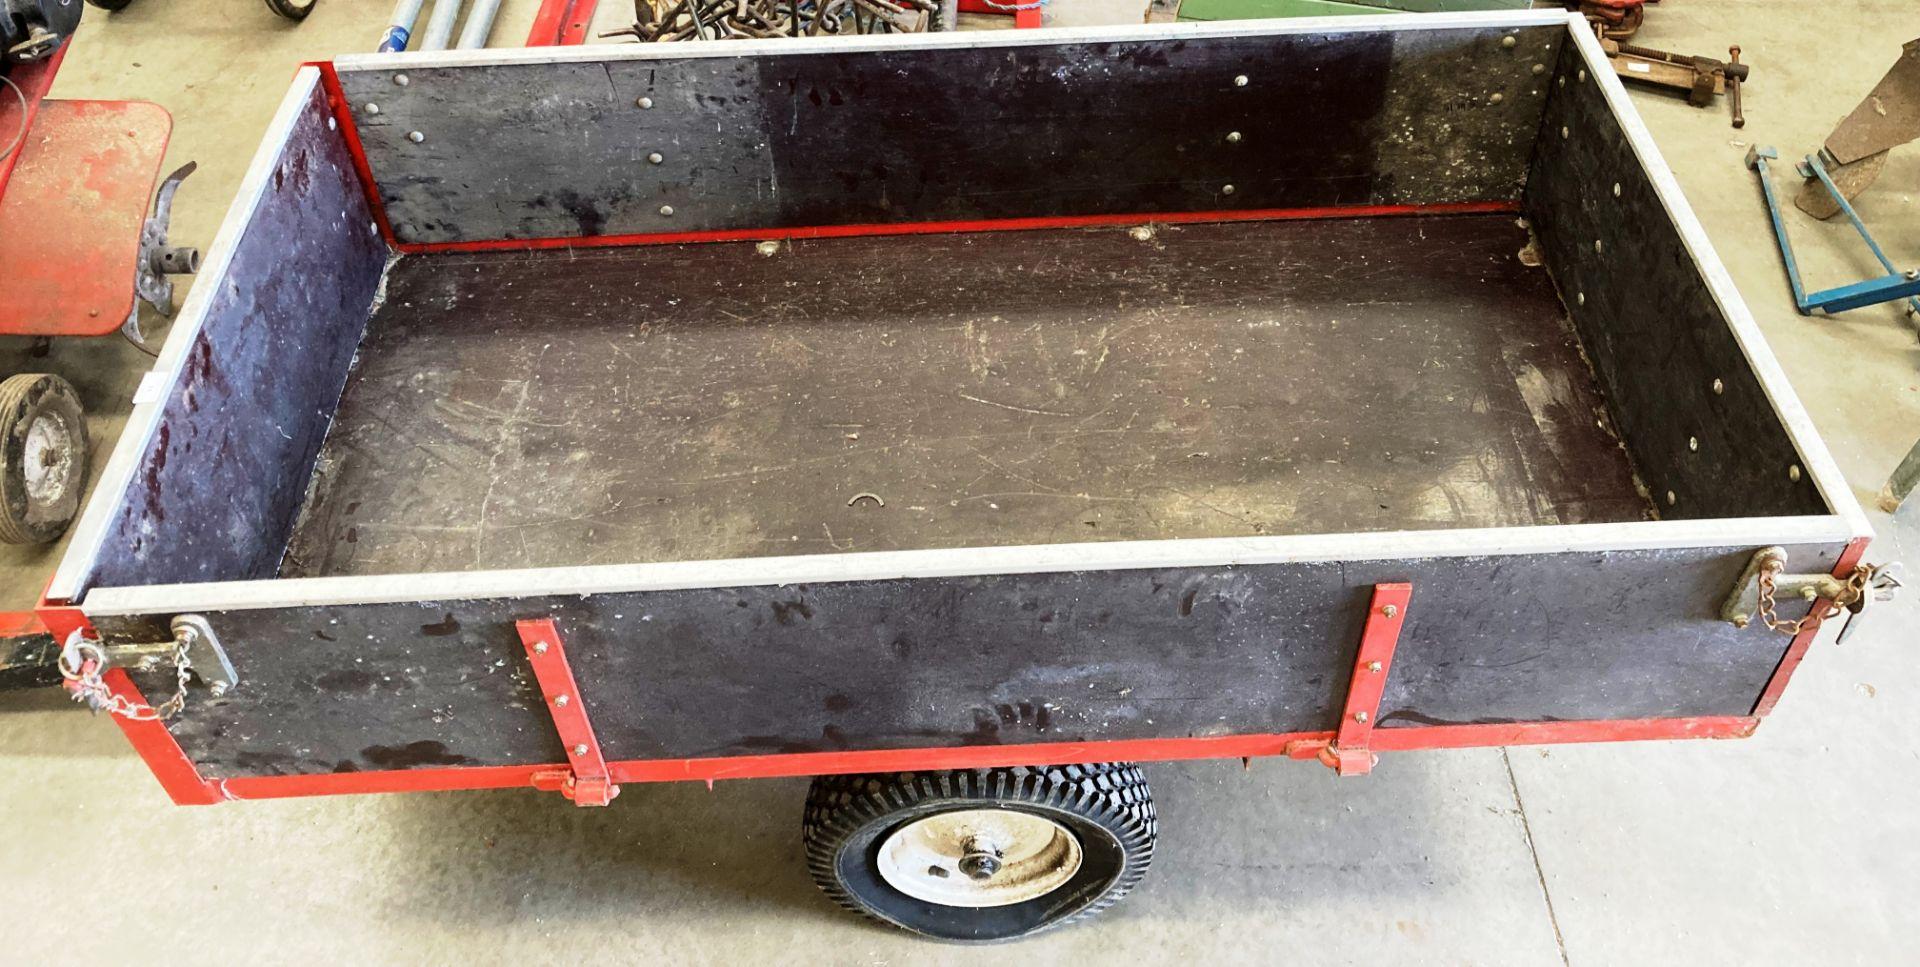 A SAXON single axle trailer model 10T, cap. 12 cu. - Image 2 of 2